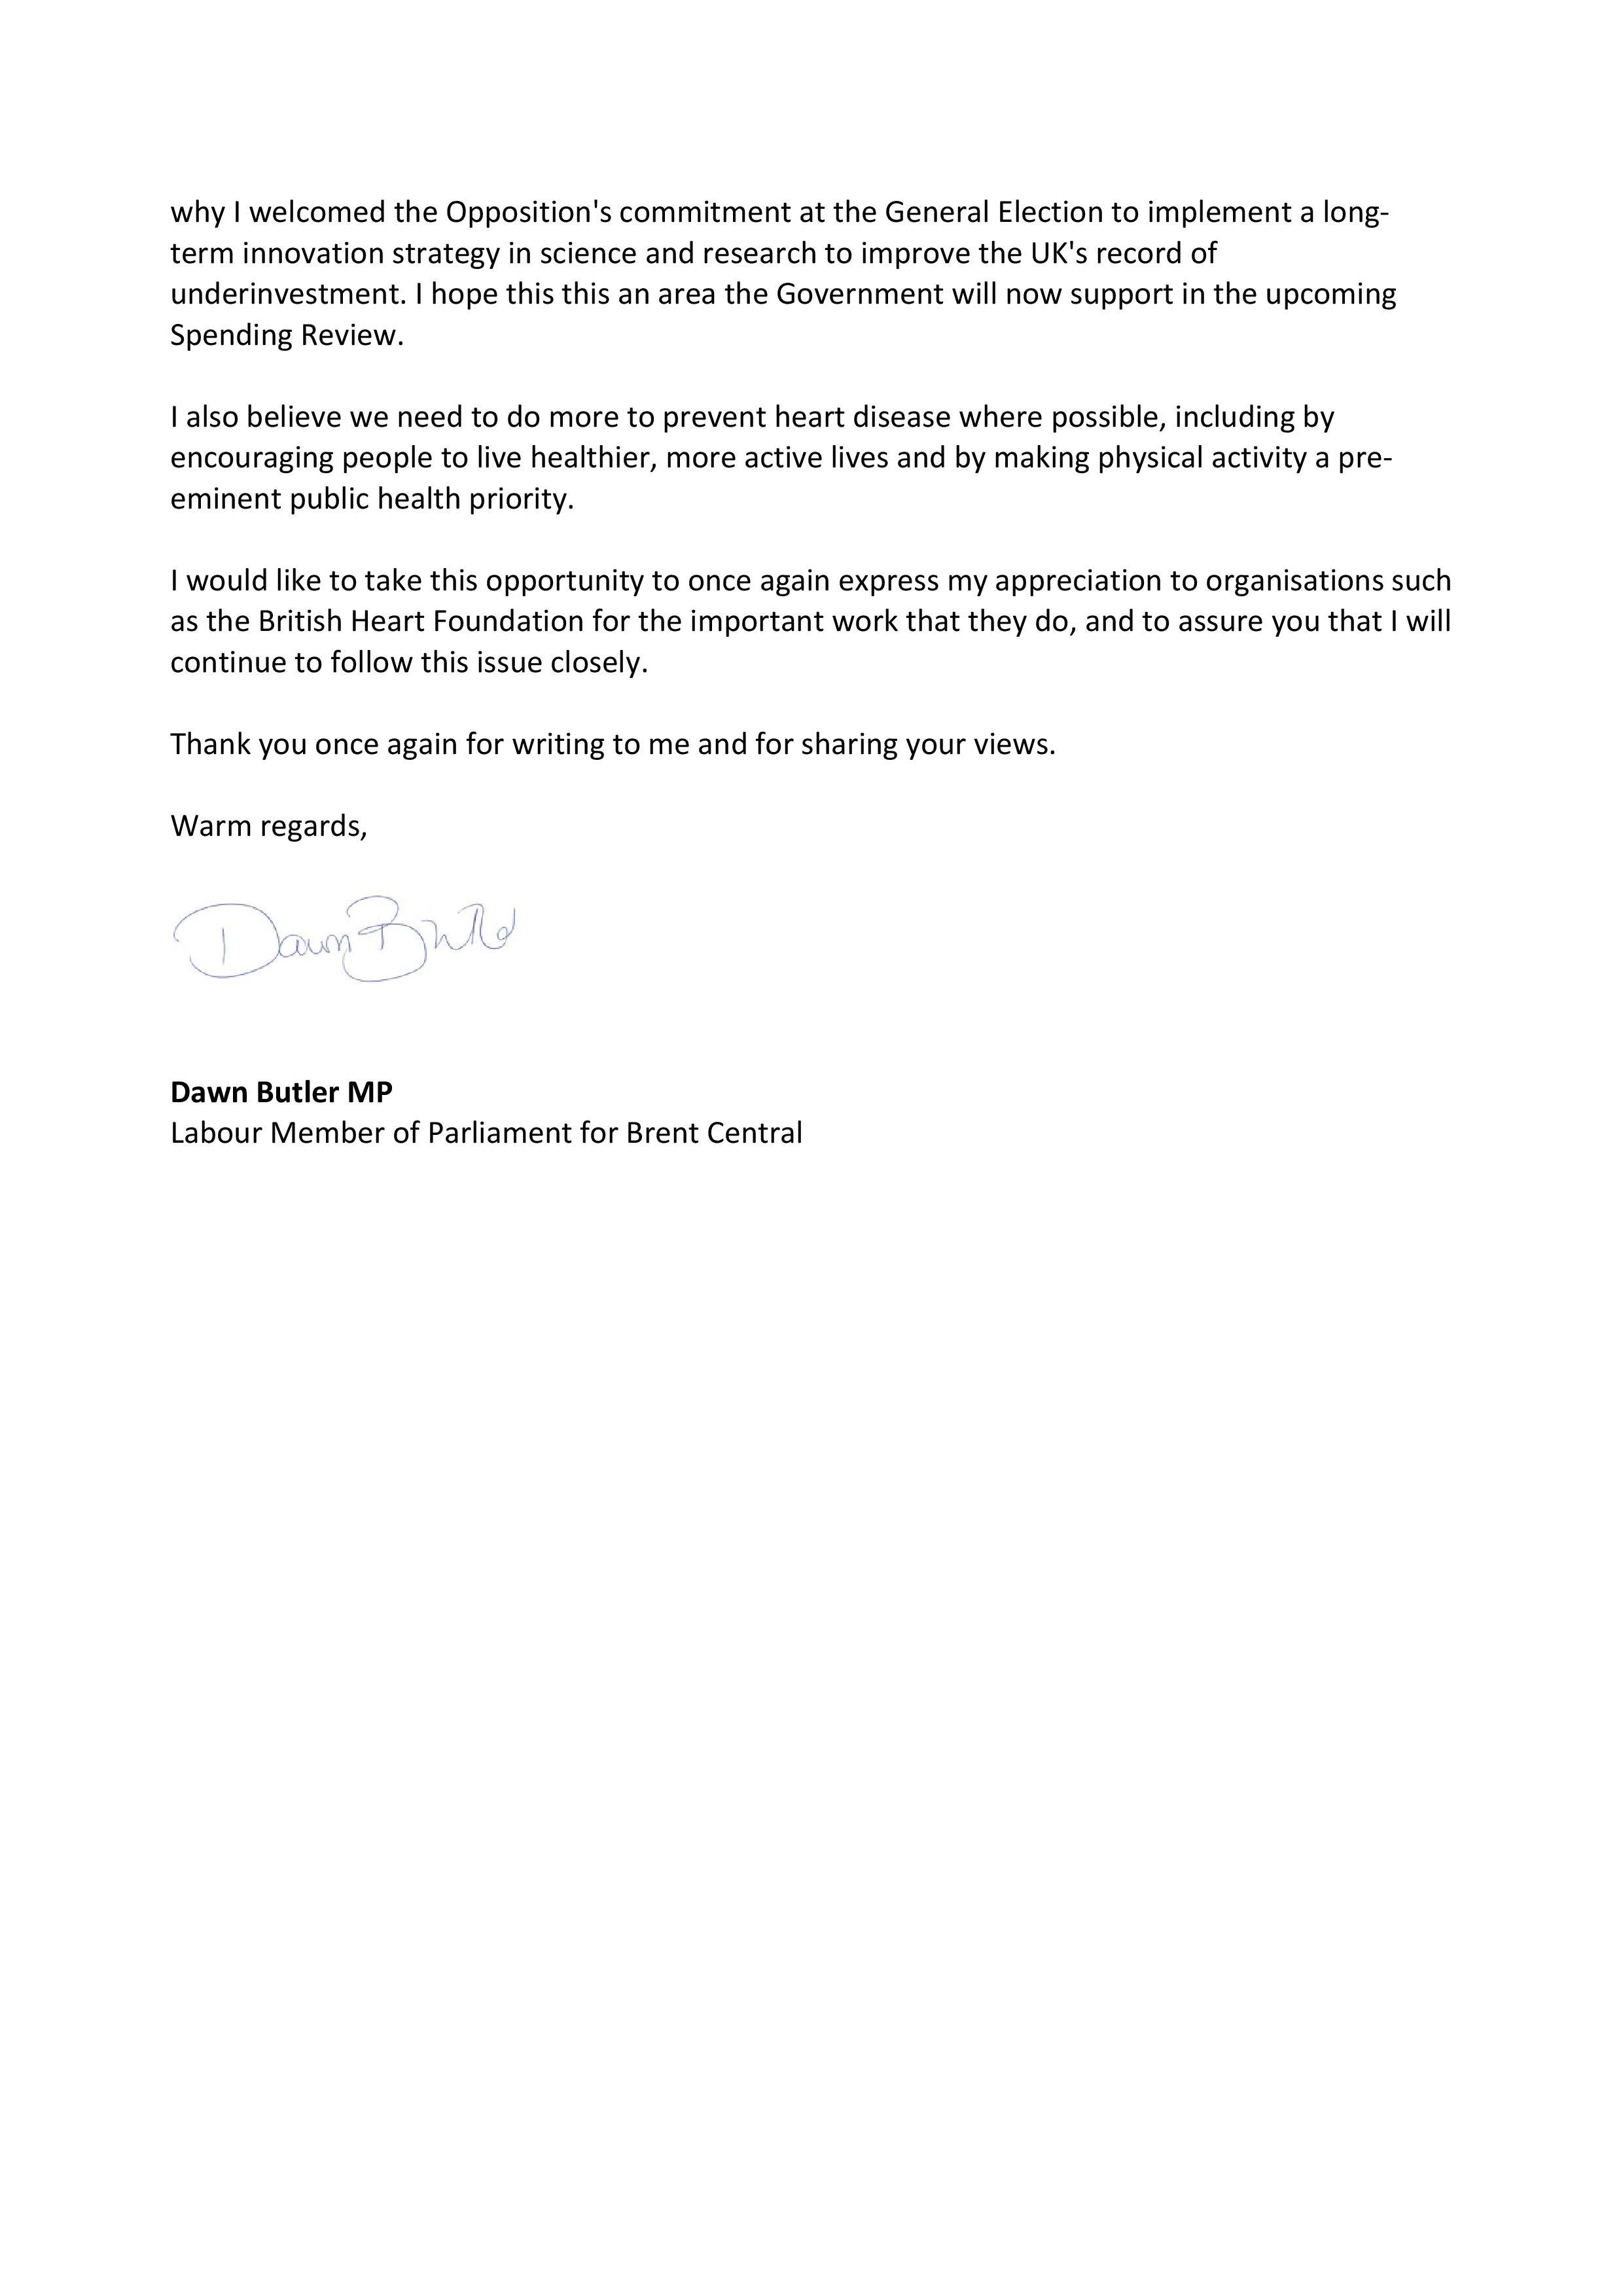 CVD_letter-page-002.jpg